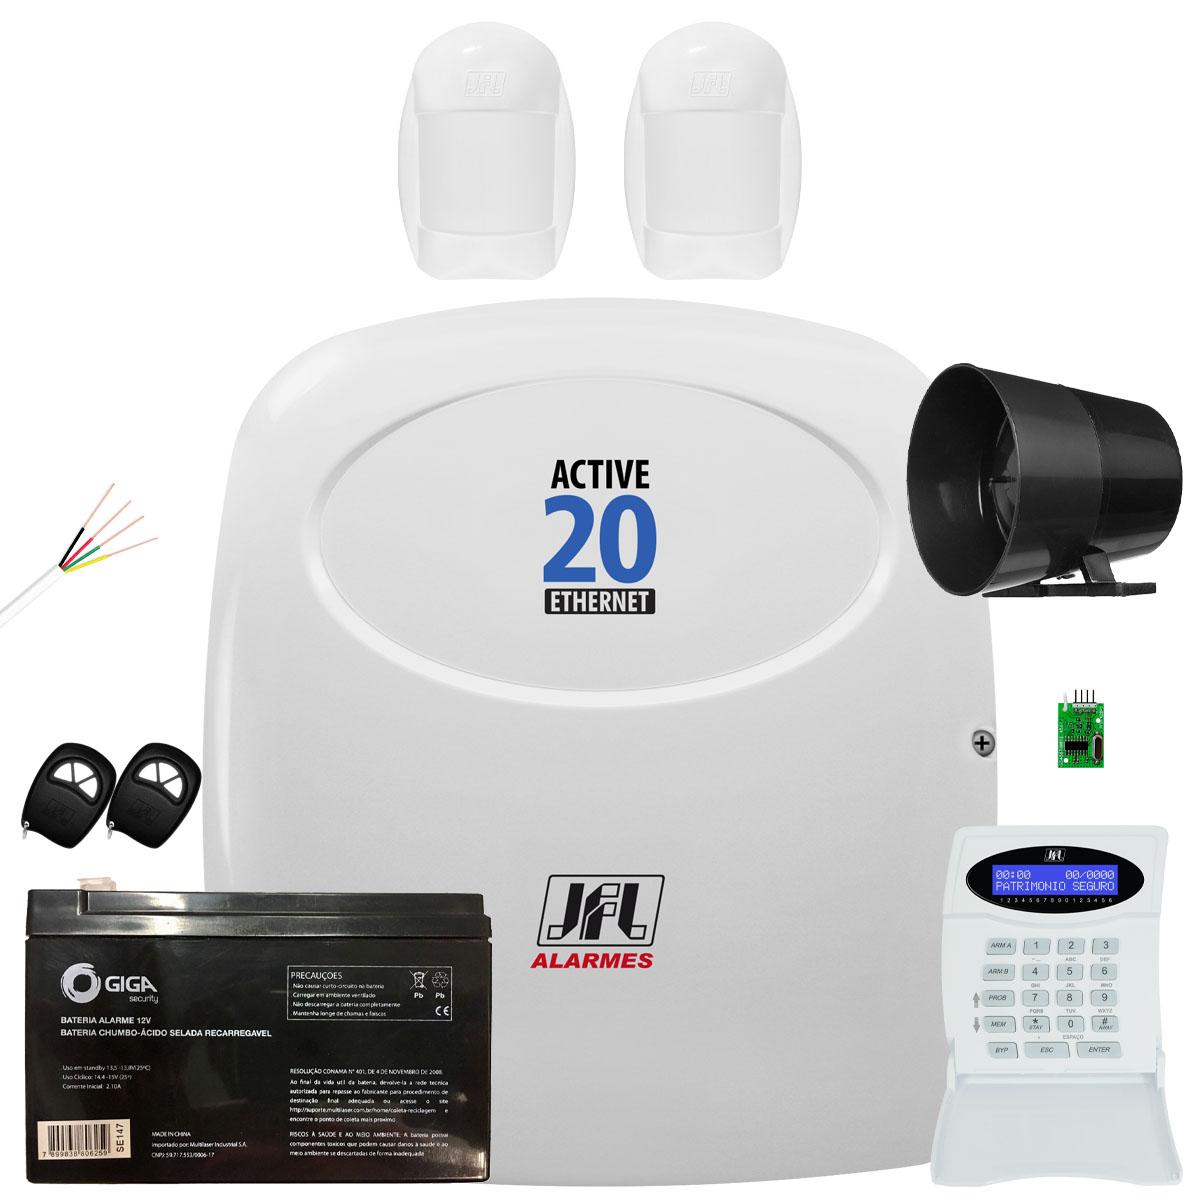 Kit Alarme Monitorado Active 20 Ethernet Com Sensor Idx 1001